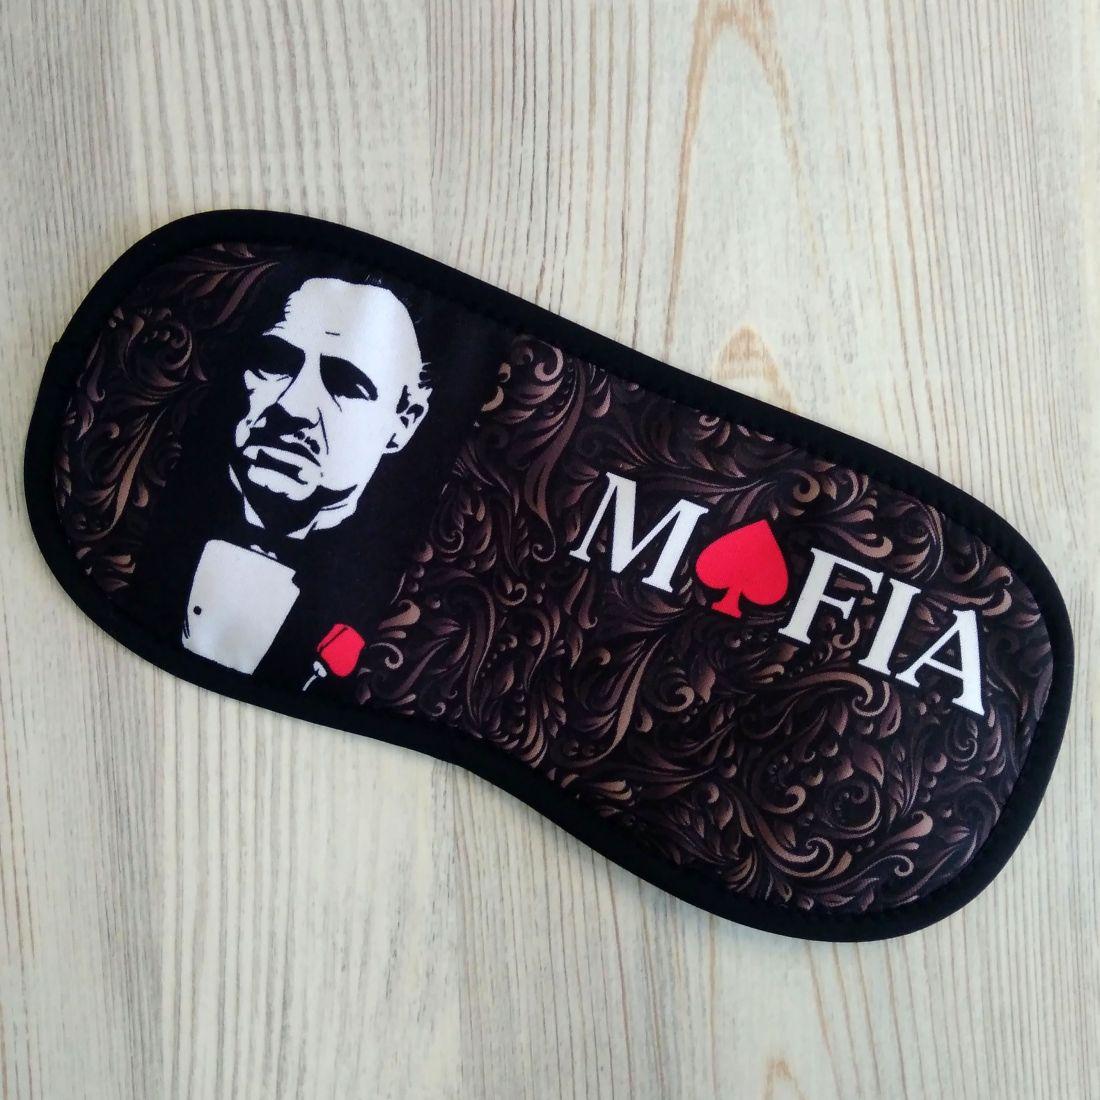 Именная маска Mafia для антикафе